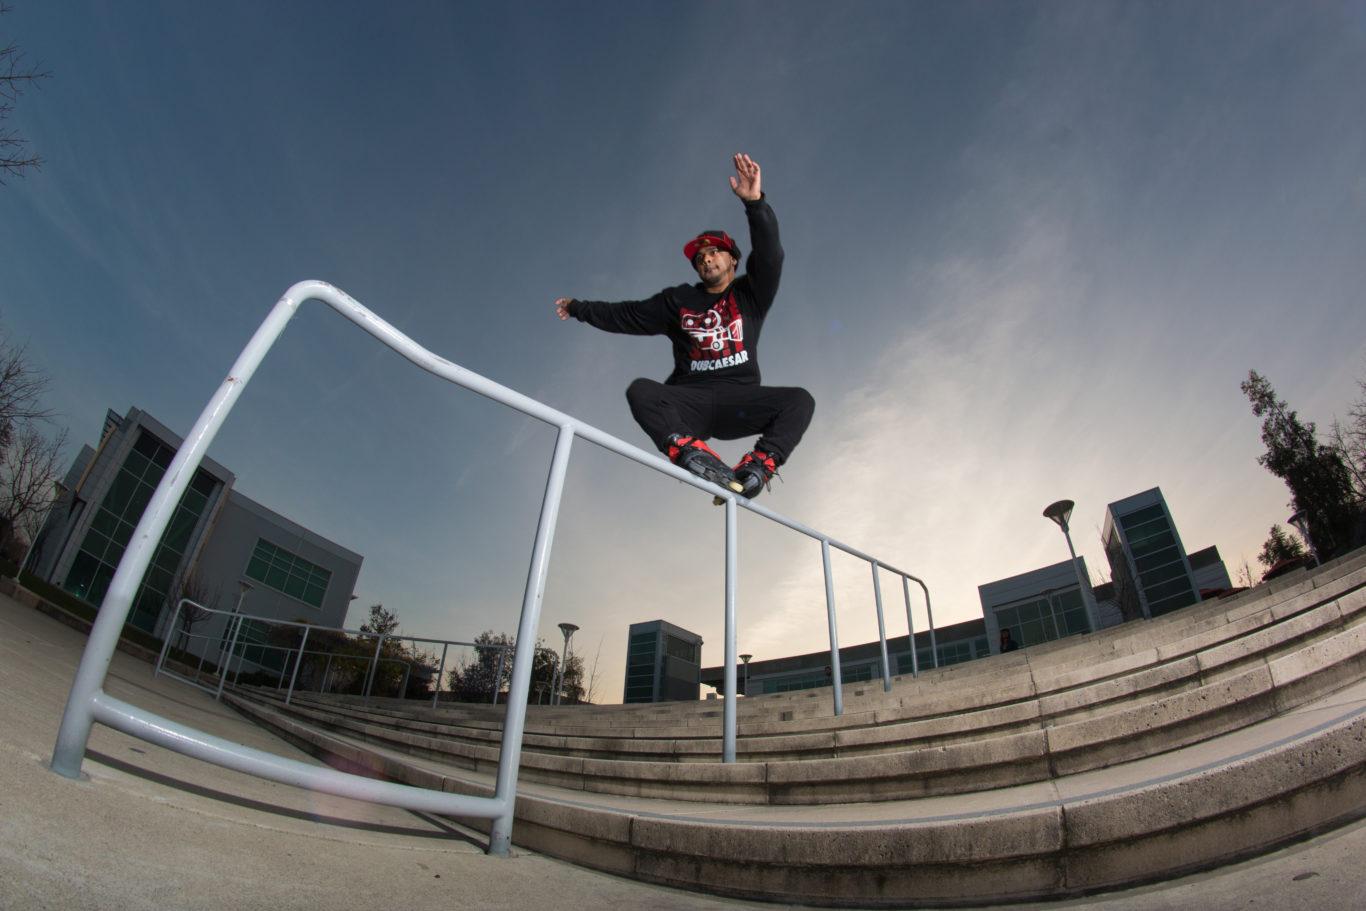 Vinny Minton - Top Mistrial - Photograph by Erick Garcia